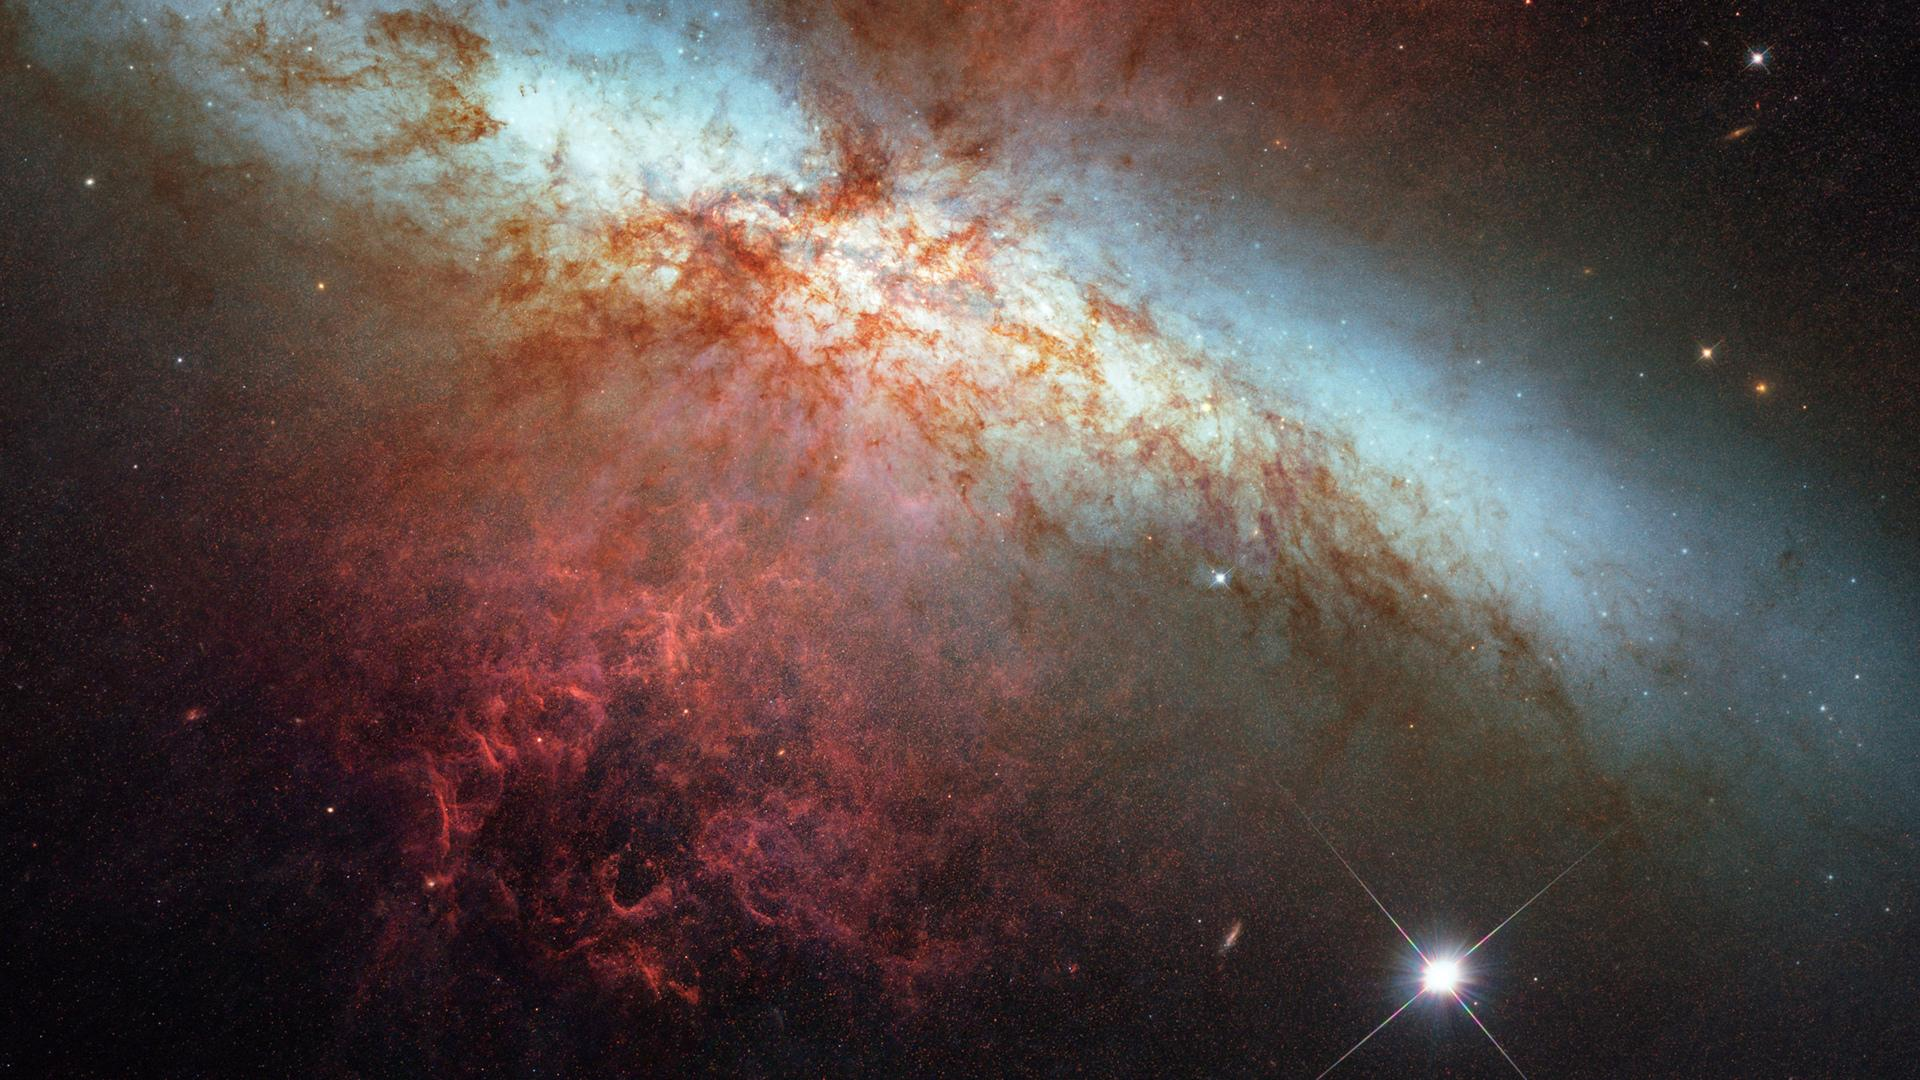 Supernova Sci Fi wallpapers HD quality